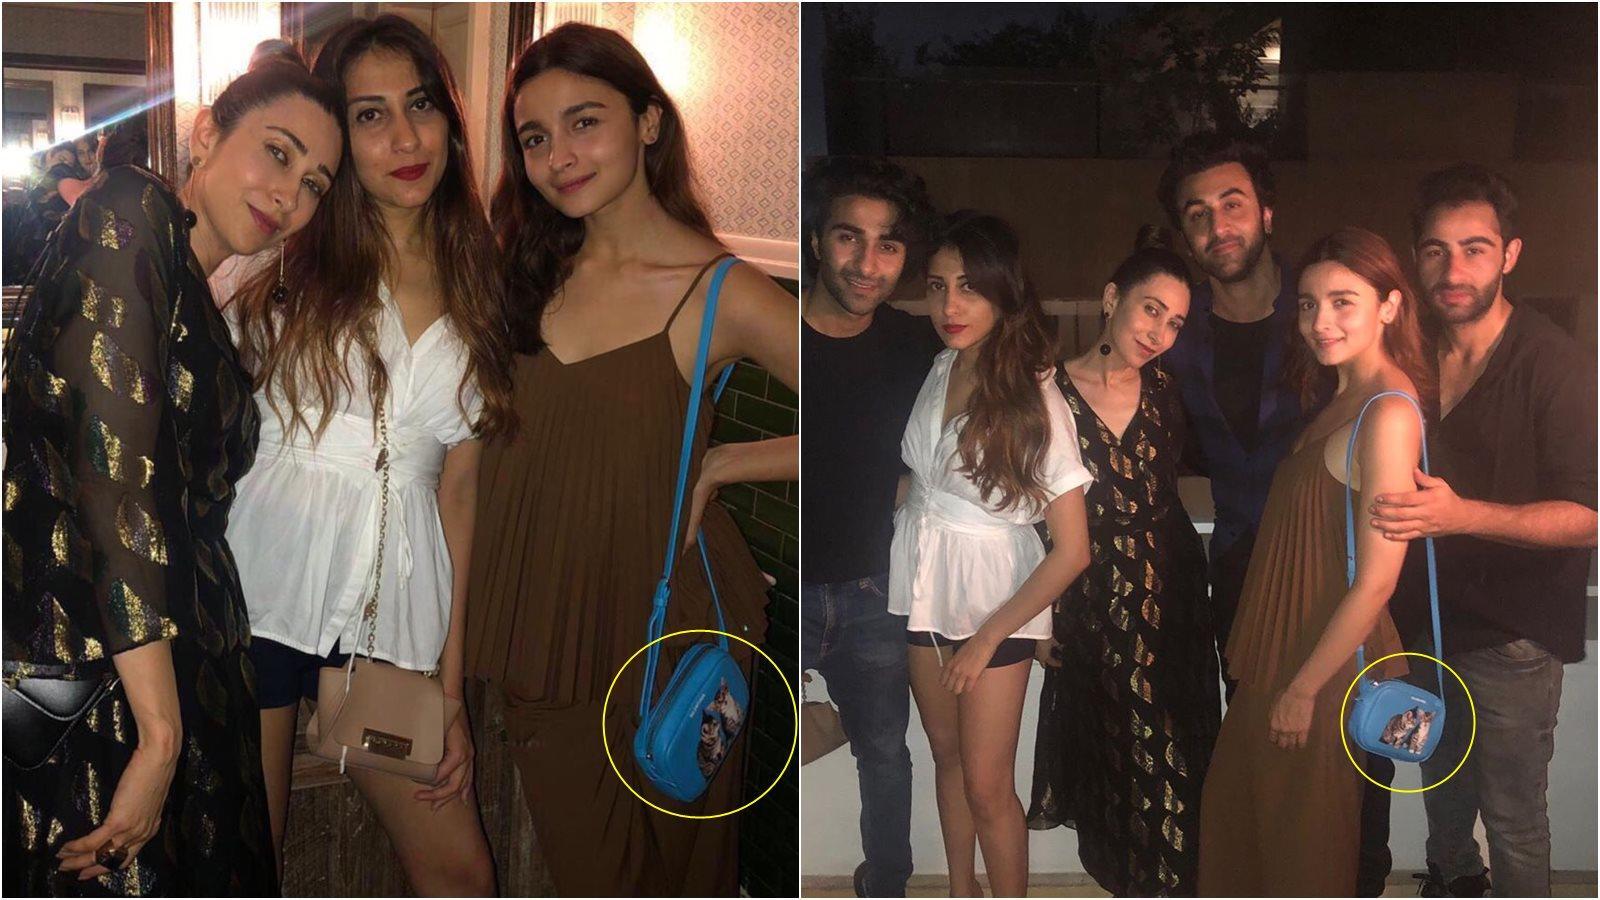 Alia Bhatt parties with Ranbir Kapoor and cousins, flaunts her expensive bag!